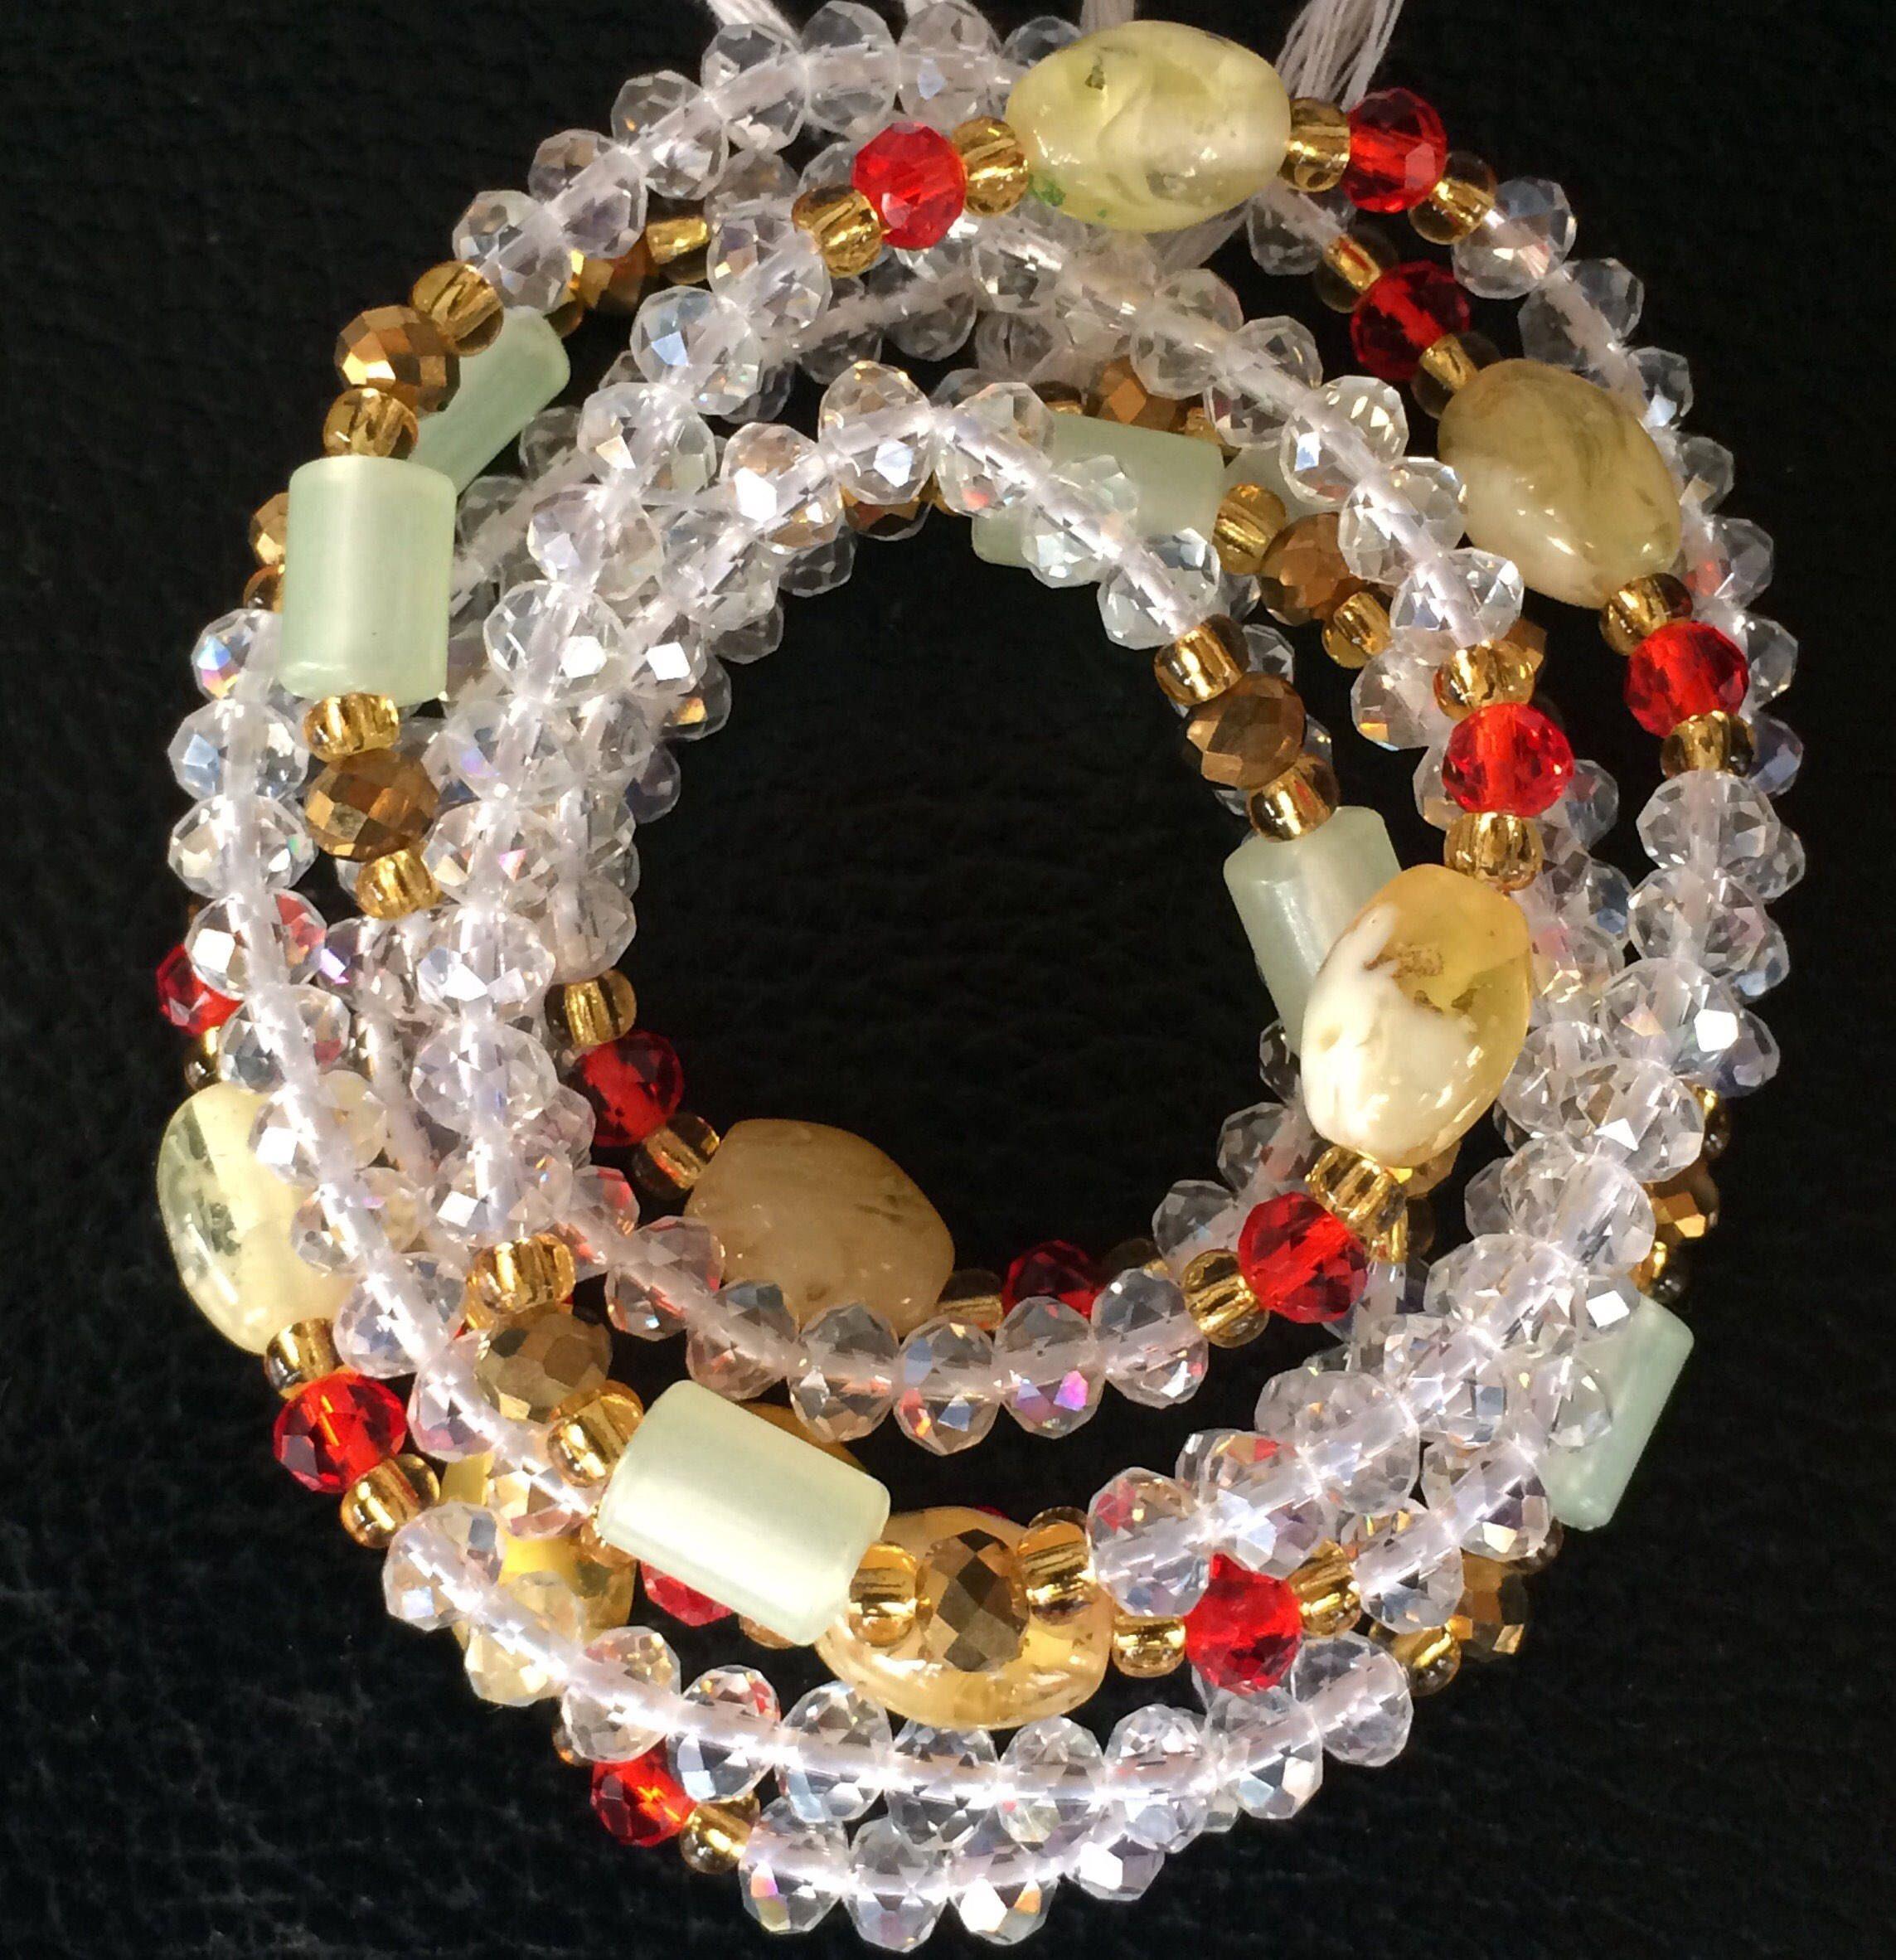 Agate beads. Plastic Beads. Crystal beads. #waistbeads ...